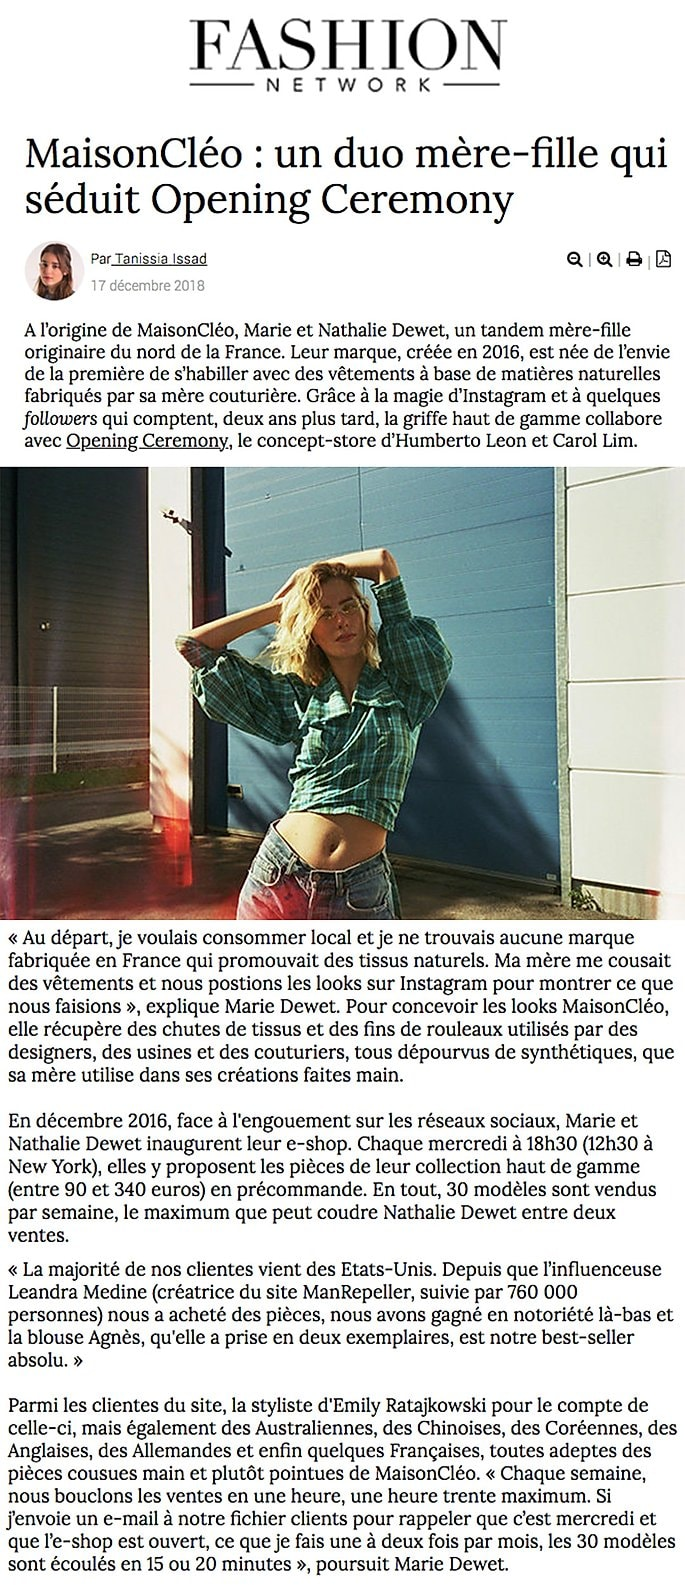 Fashion Network / MaisonCléo